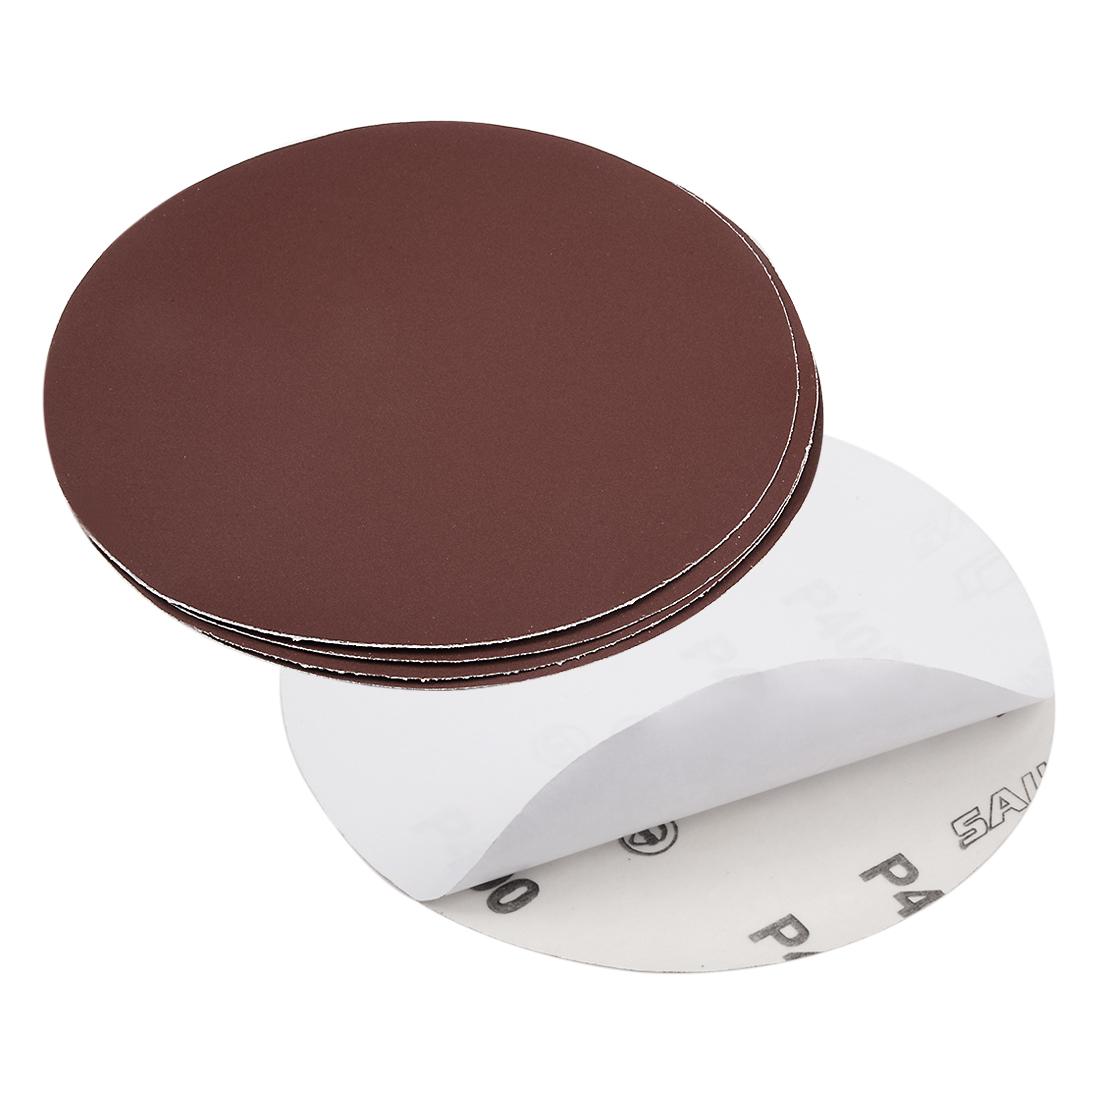 6-inch 400-Grits PSA Sanding Disc, Adhesive-Backed for Orbital Sander 5pcs